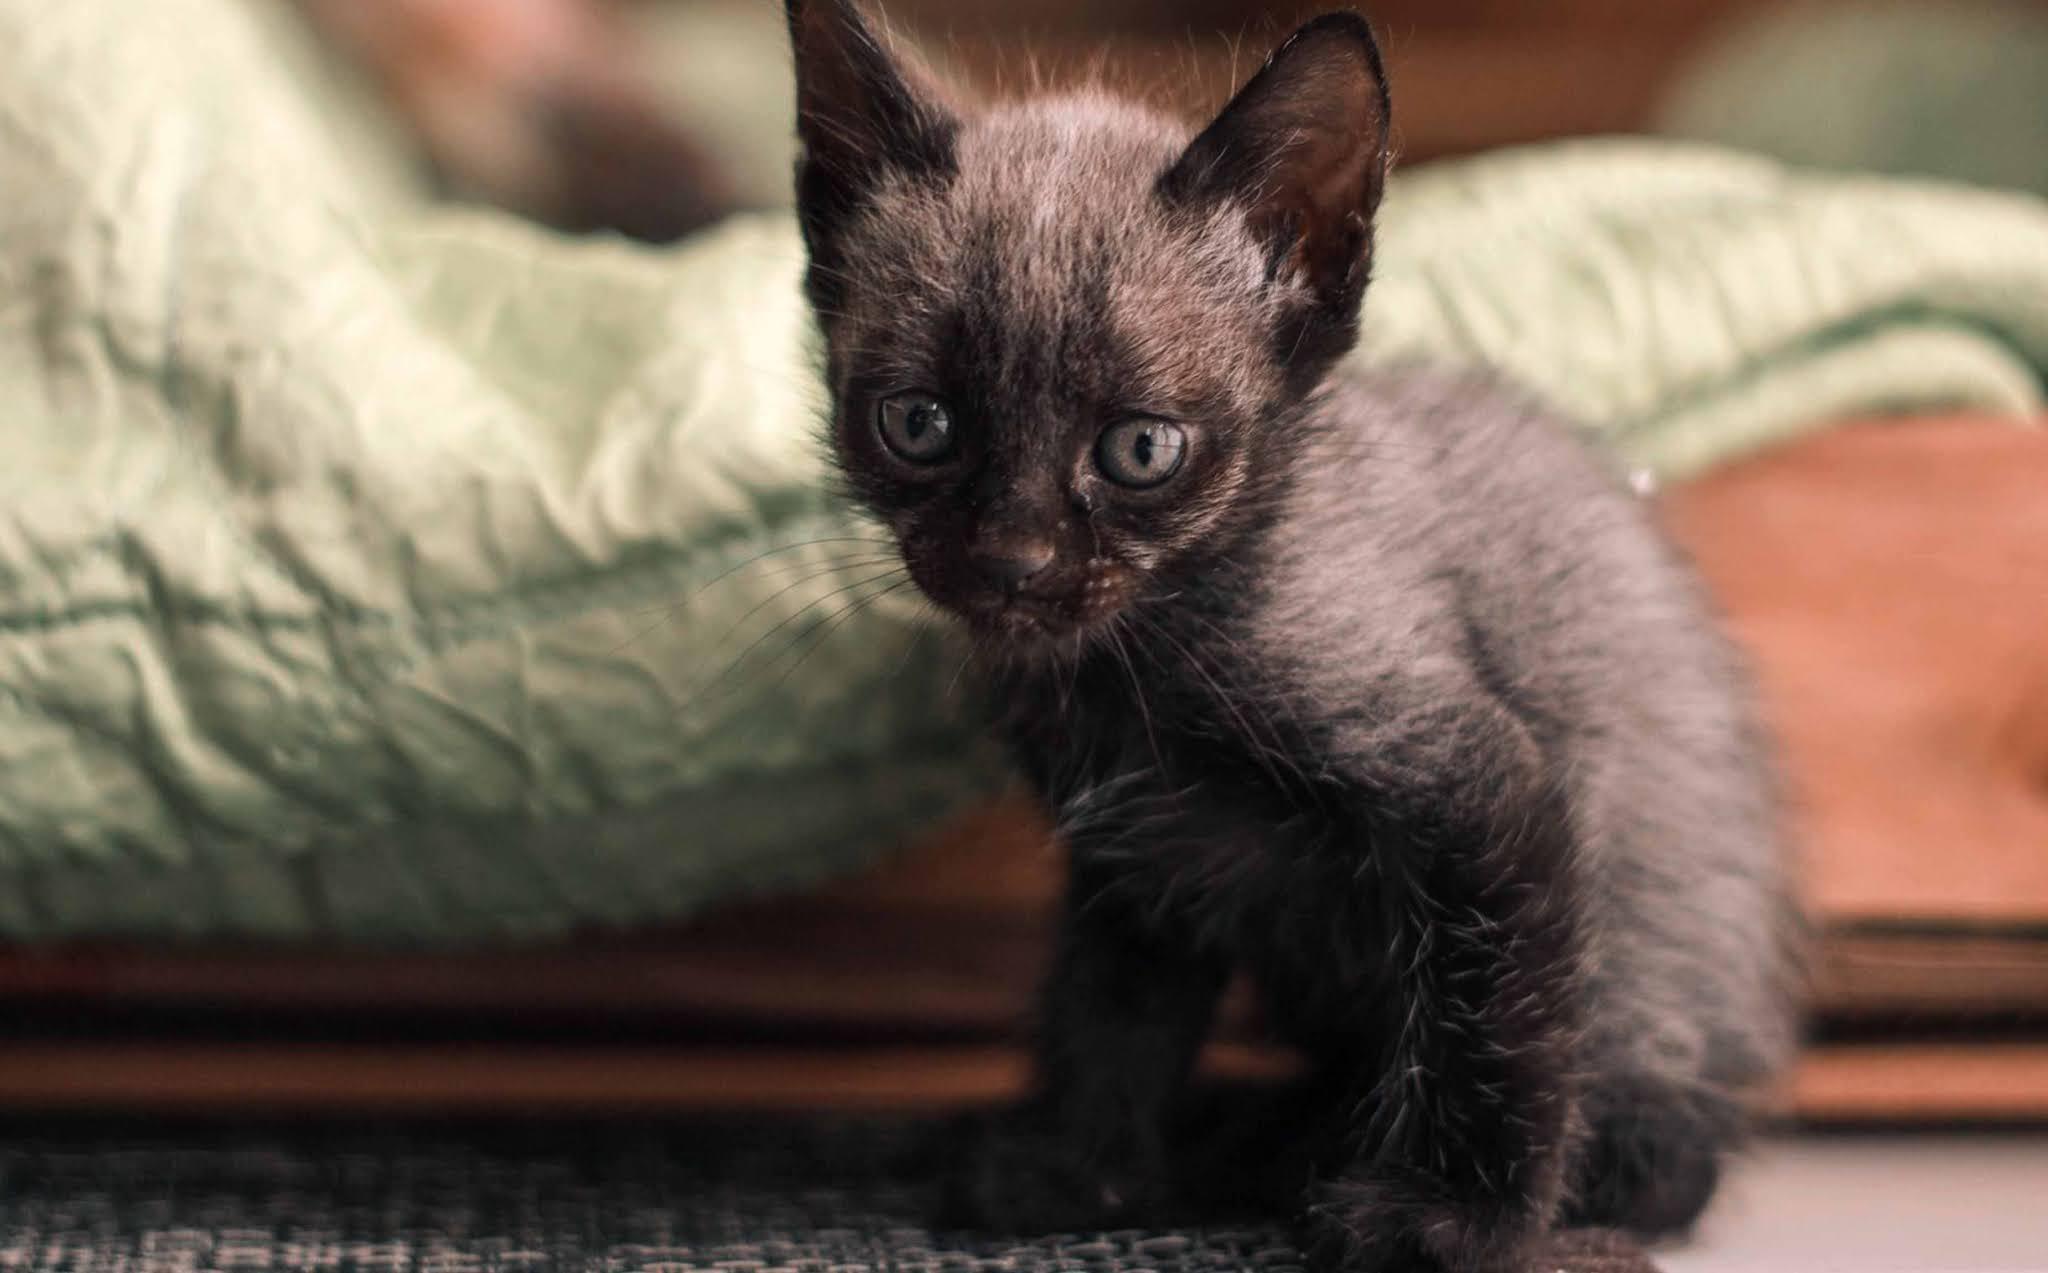 22 Best of wallpaper image kitten, cat, cute, sunlight, glare wallpaper, background Ultra HD for Computer Desktop